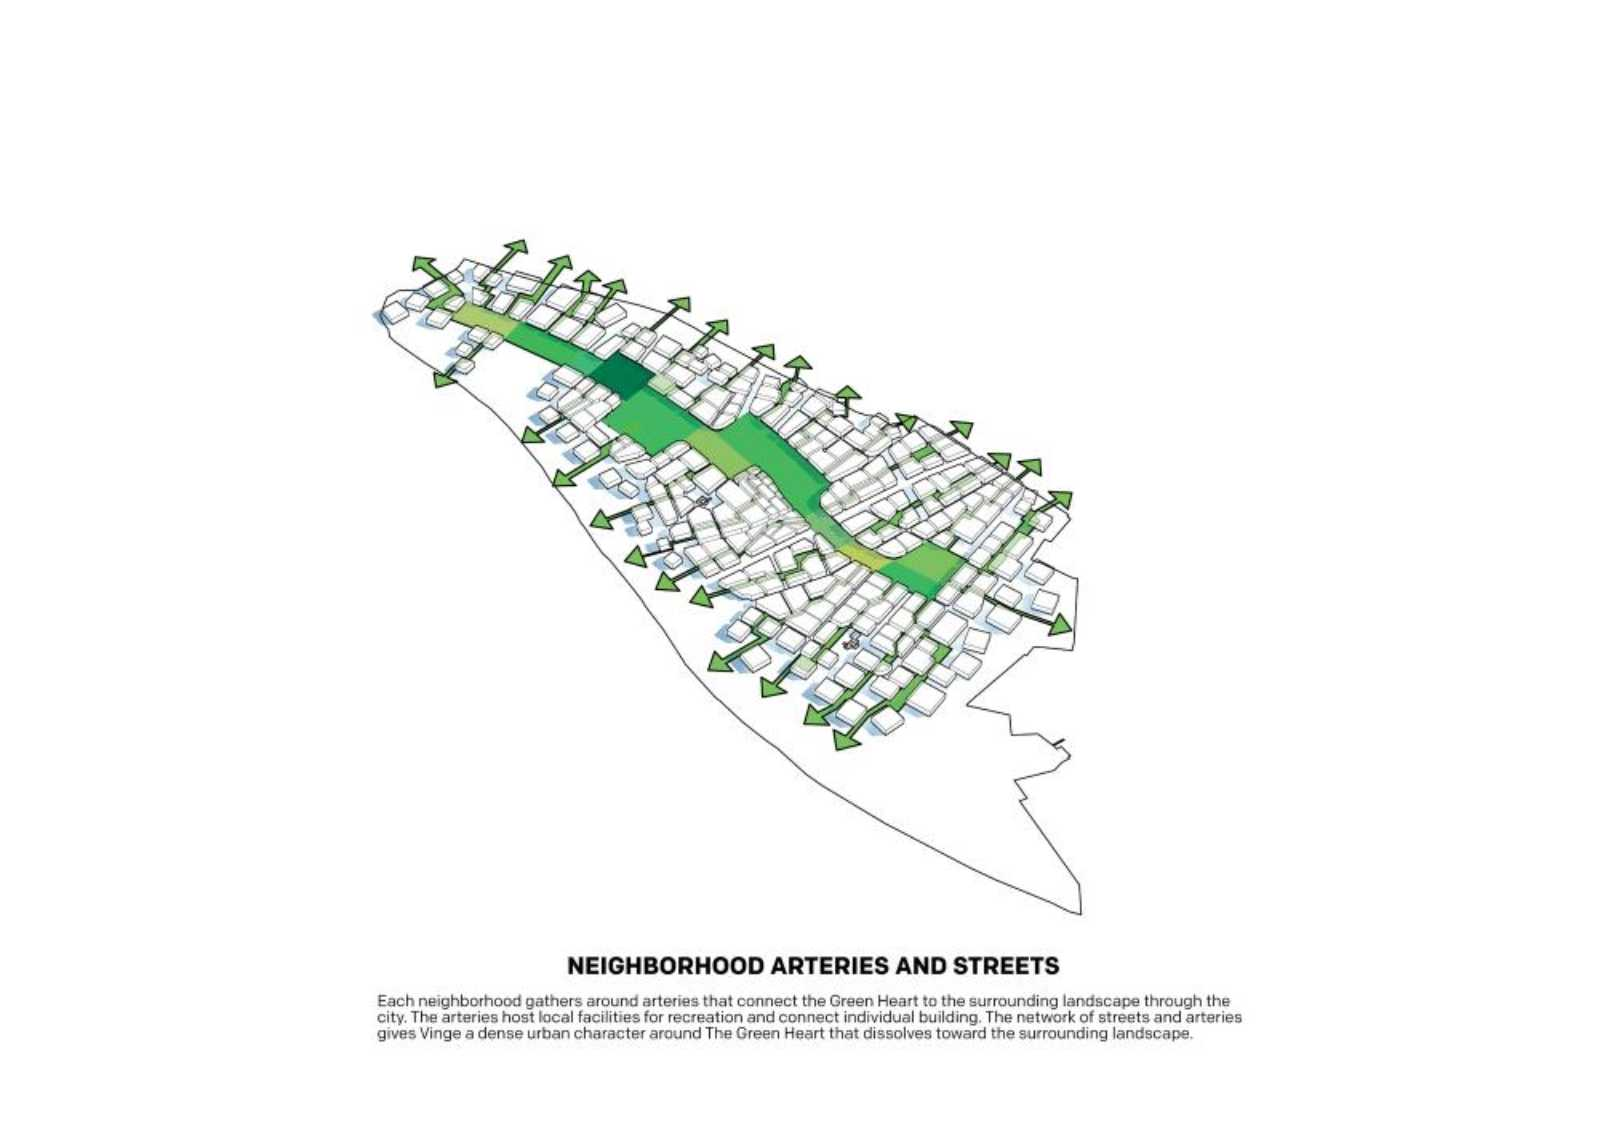 vinge city by henning larsen architects and effekt